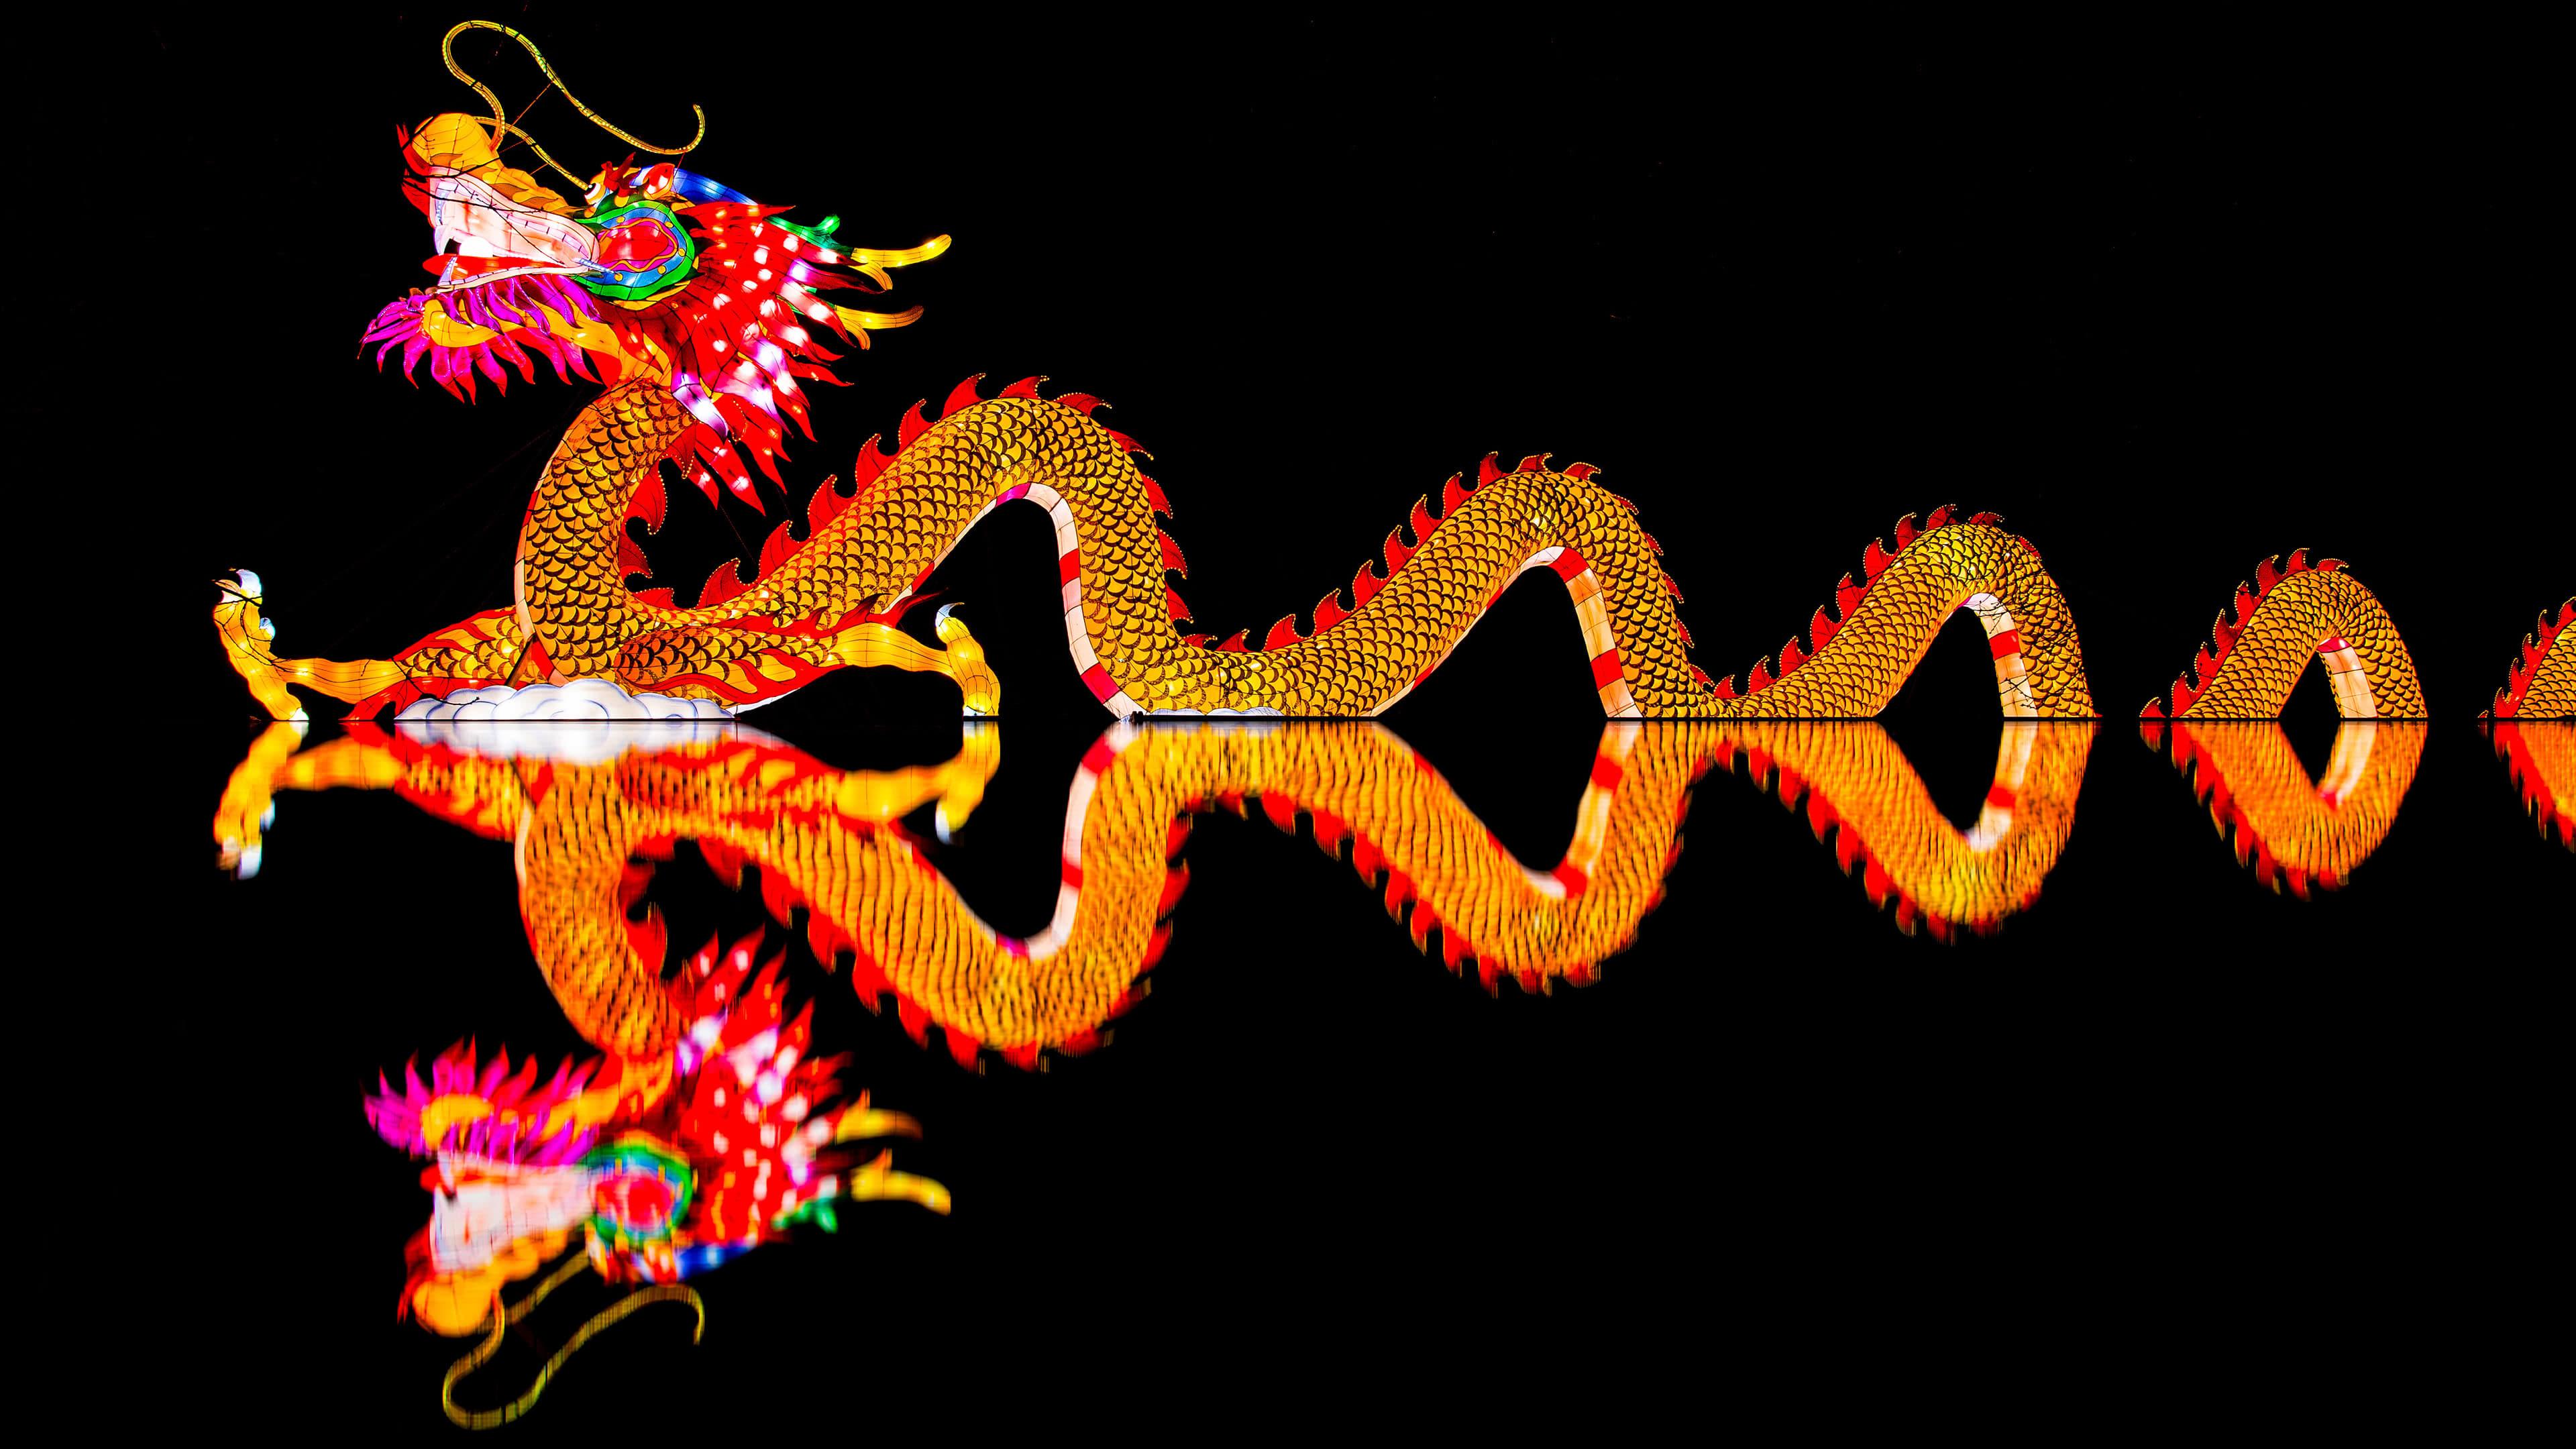 chinese light dragon uhd 4k wallpaper